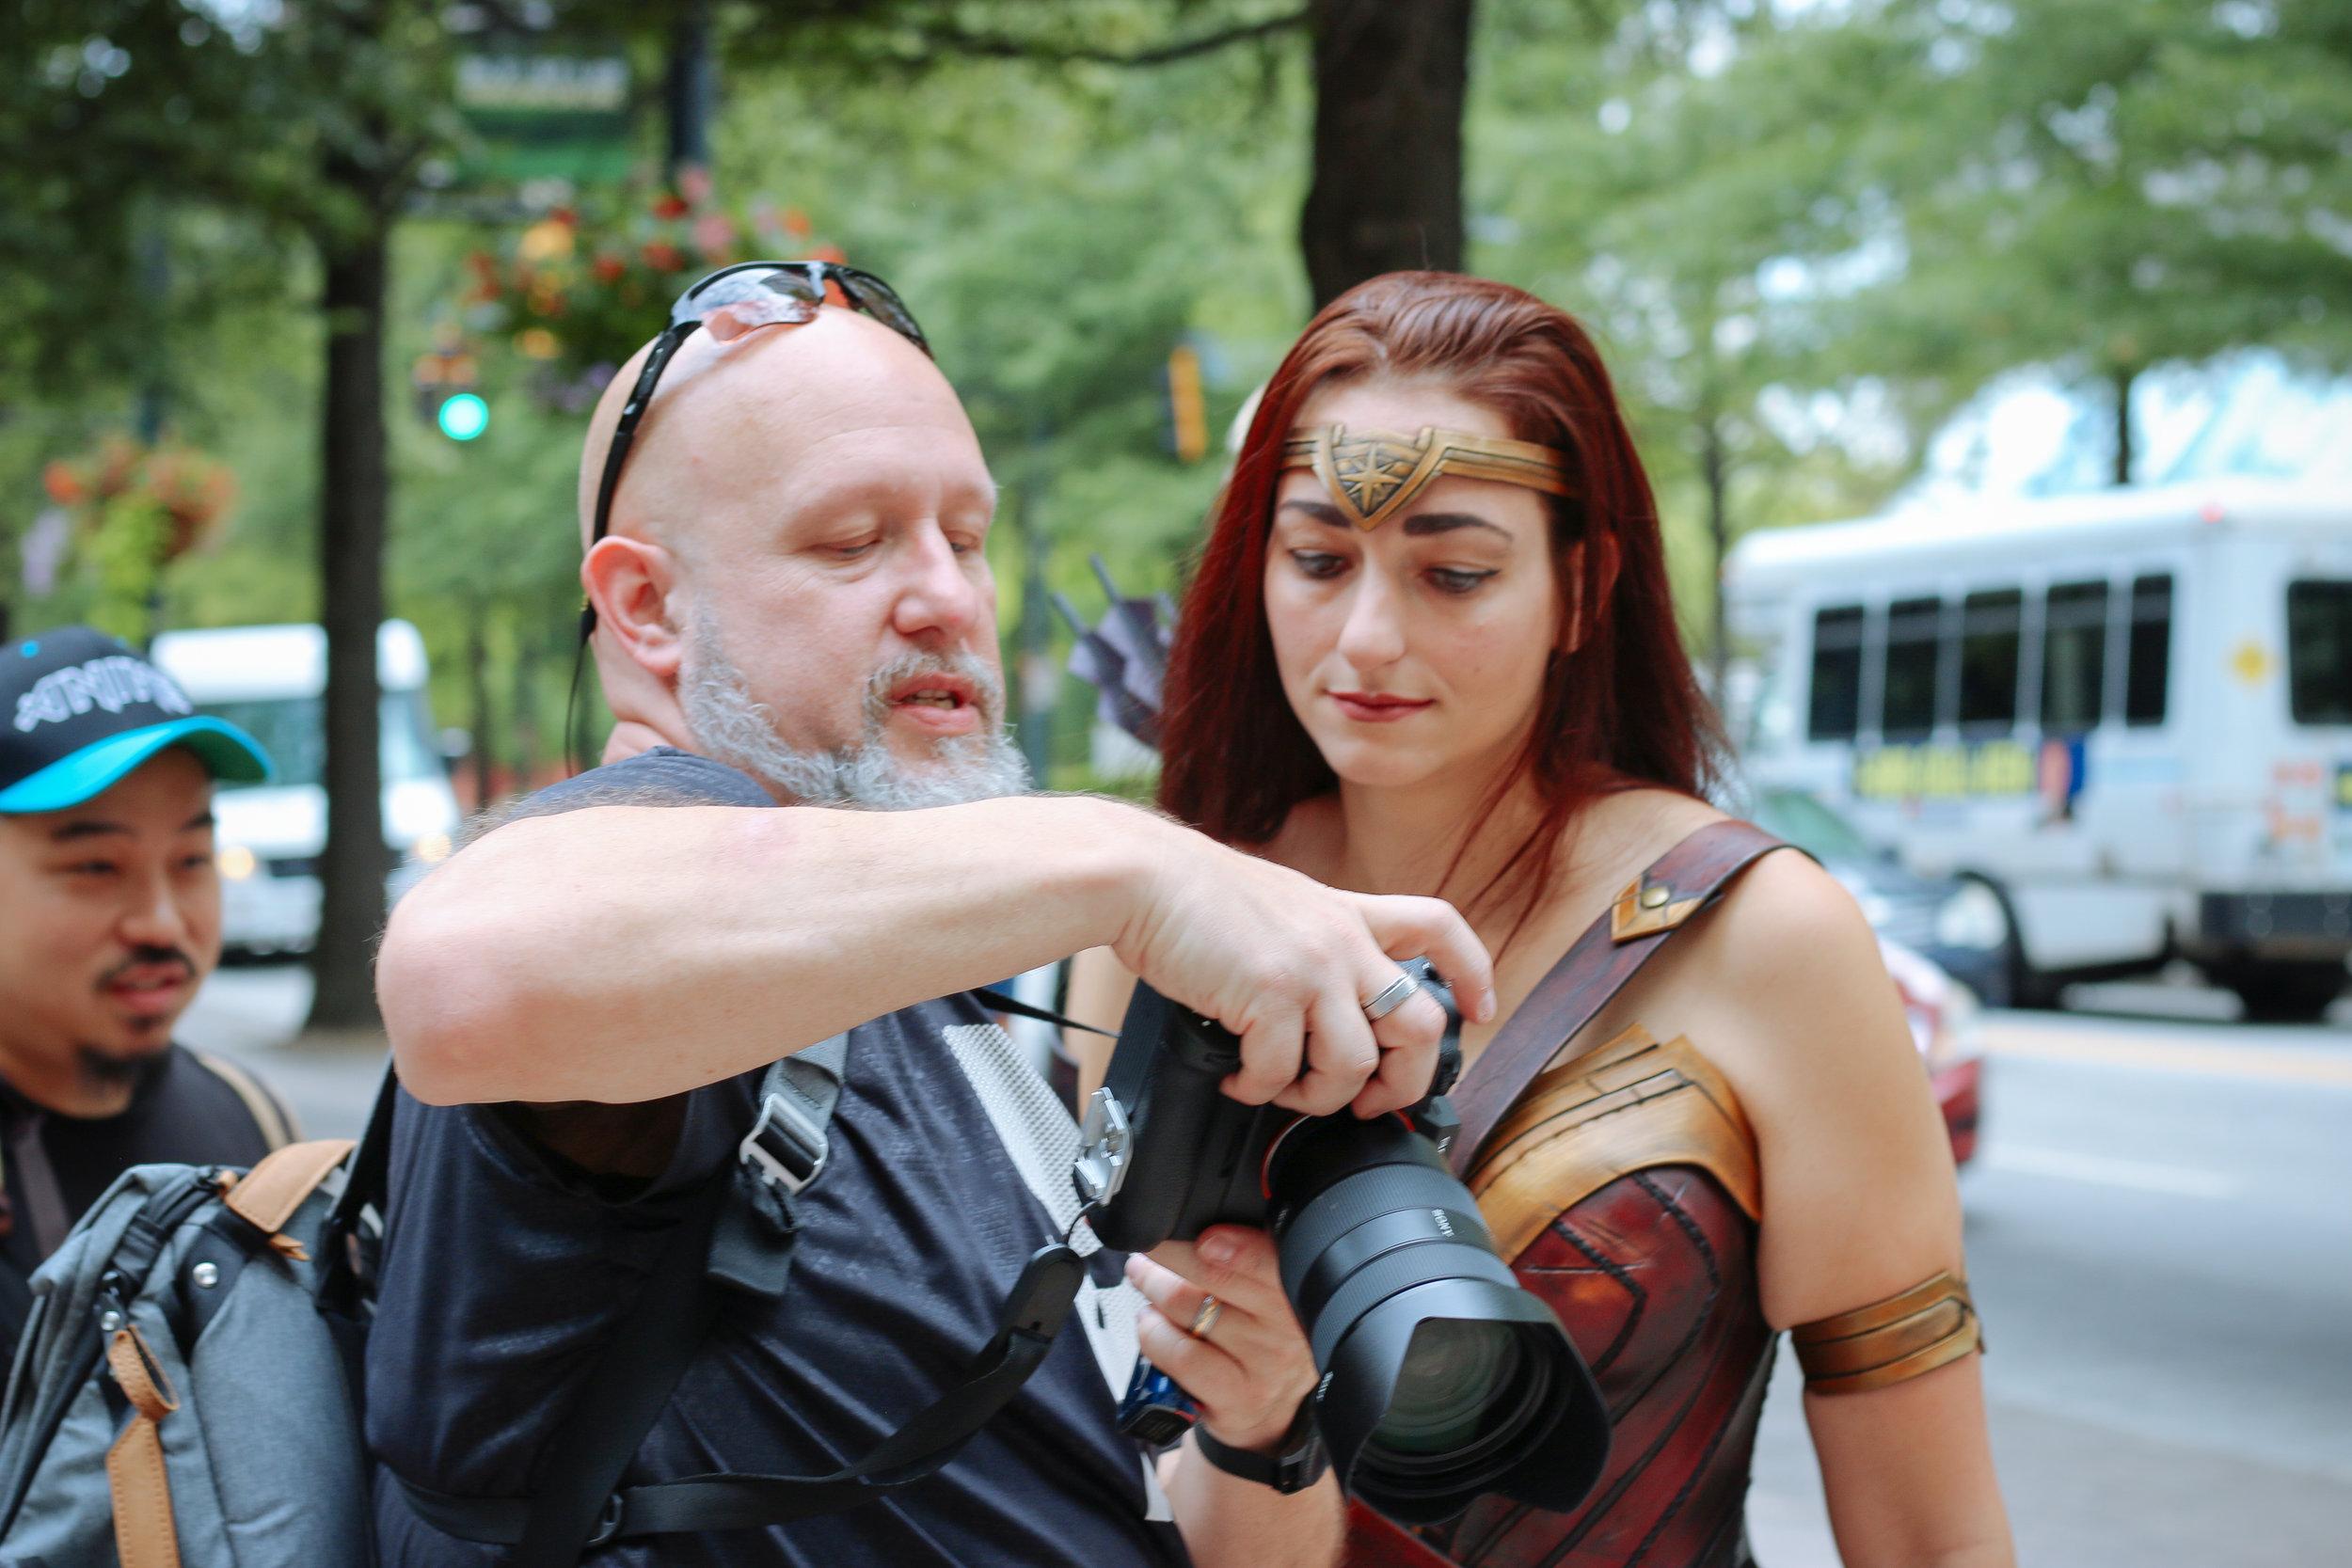 20180831_BAPPhotography_AtlantaPhotographer_DragonCon_98.jpg